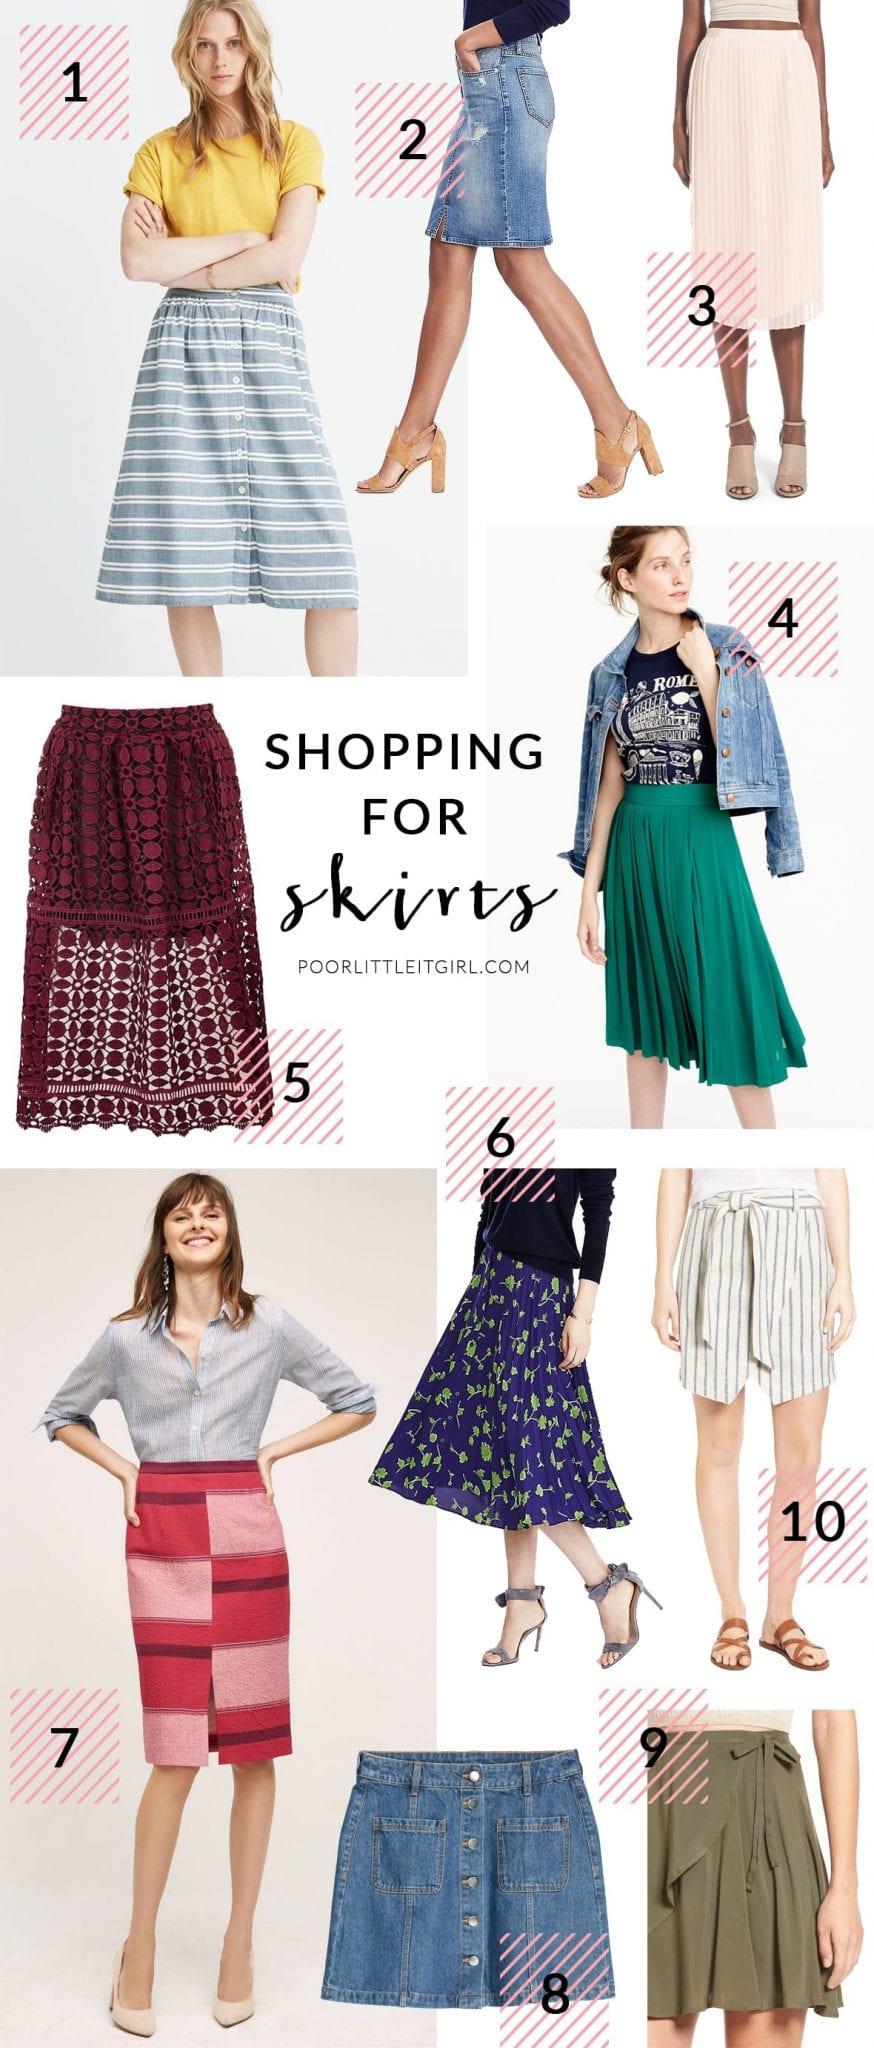 Poor Little It Girl - Summer To Fall Transitional Skirts - @poorlilitgirl